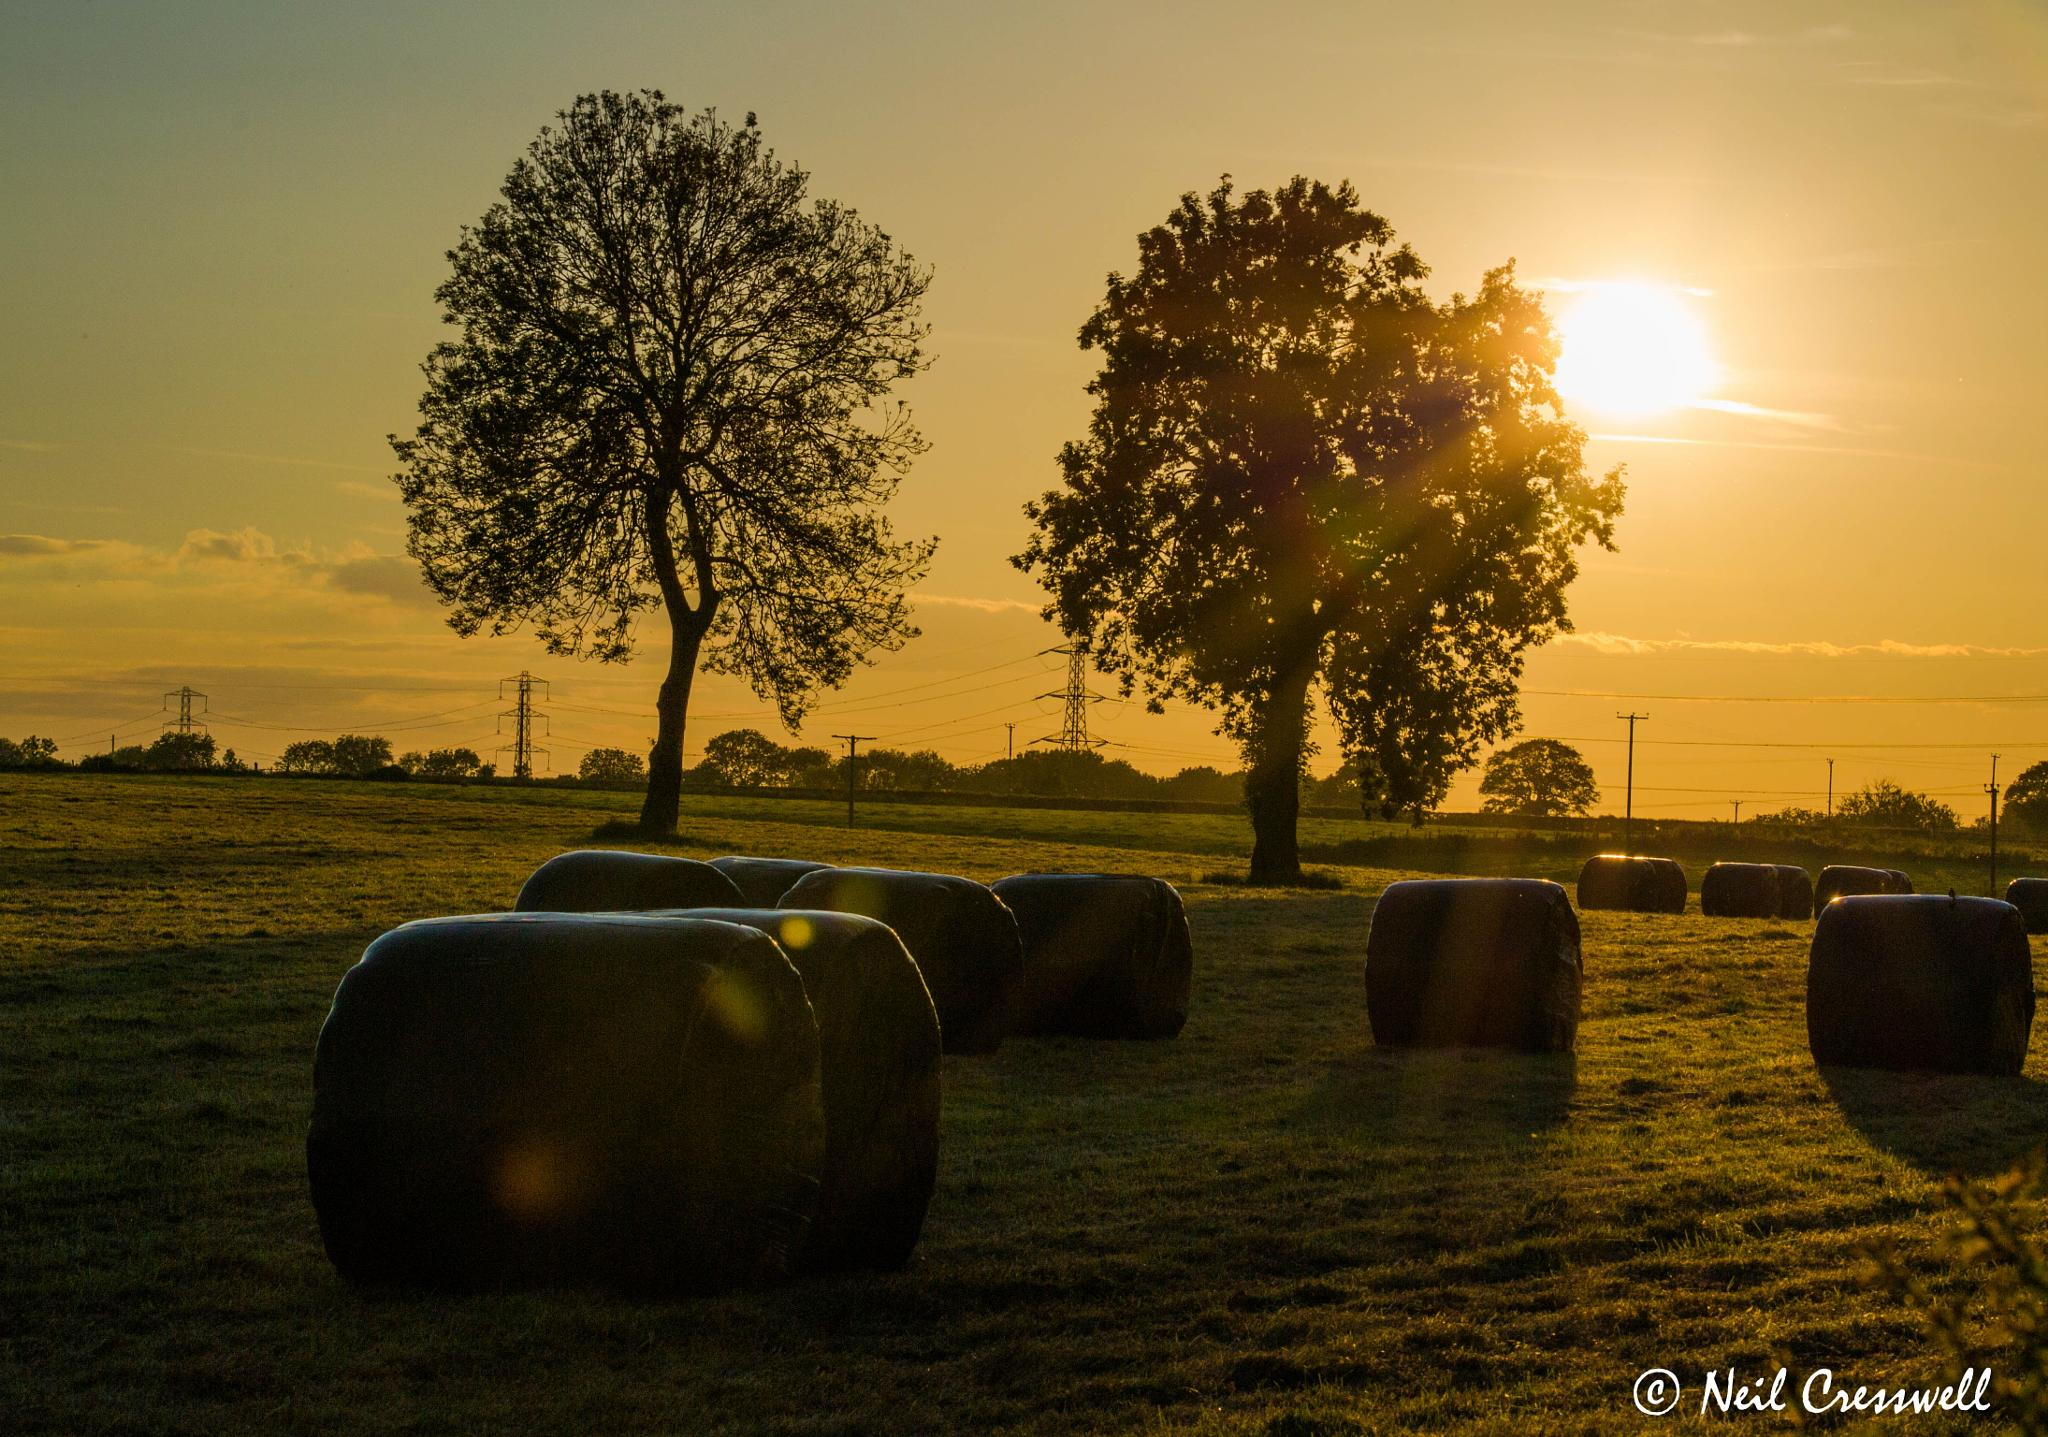 Sun setting across the fields by Neil Cresswell